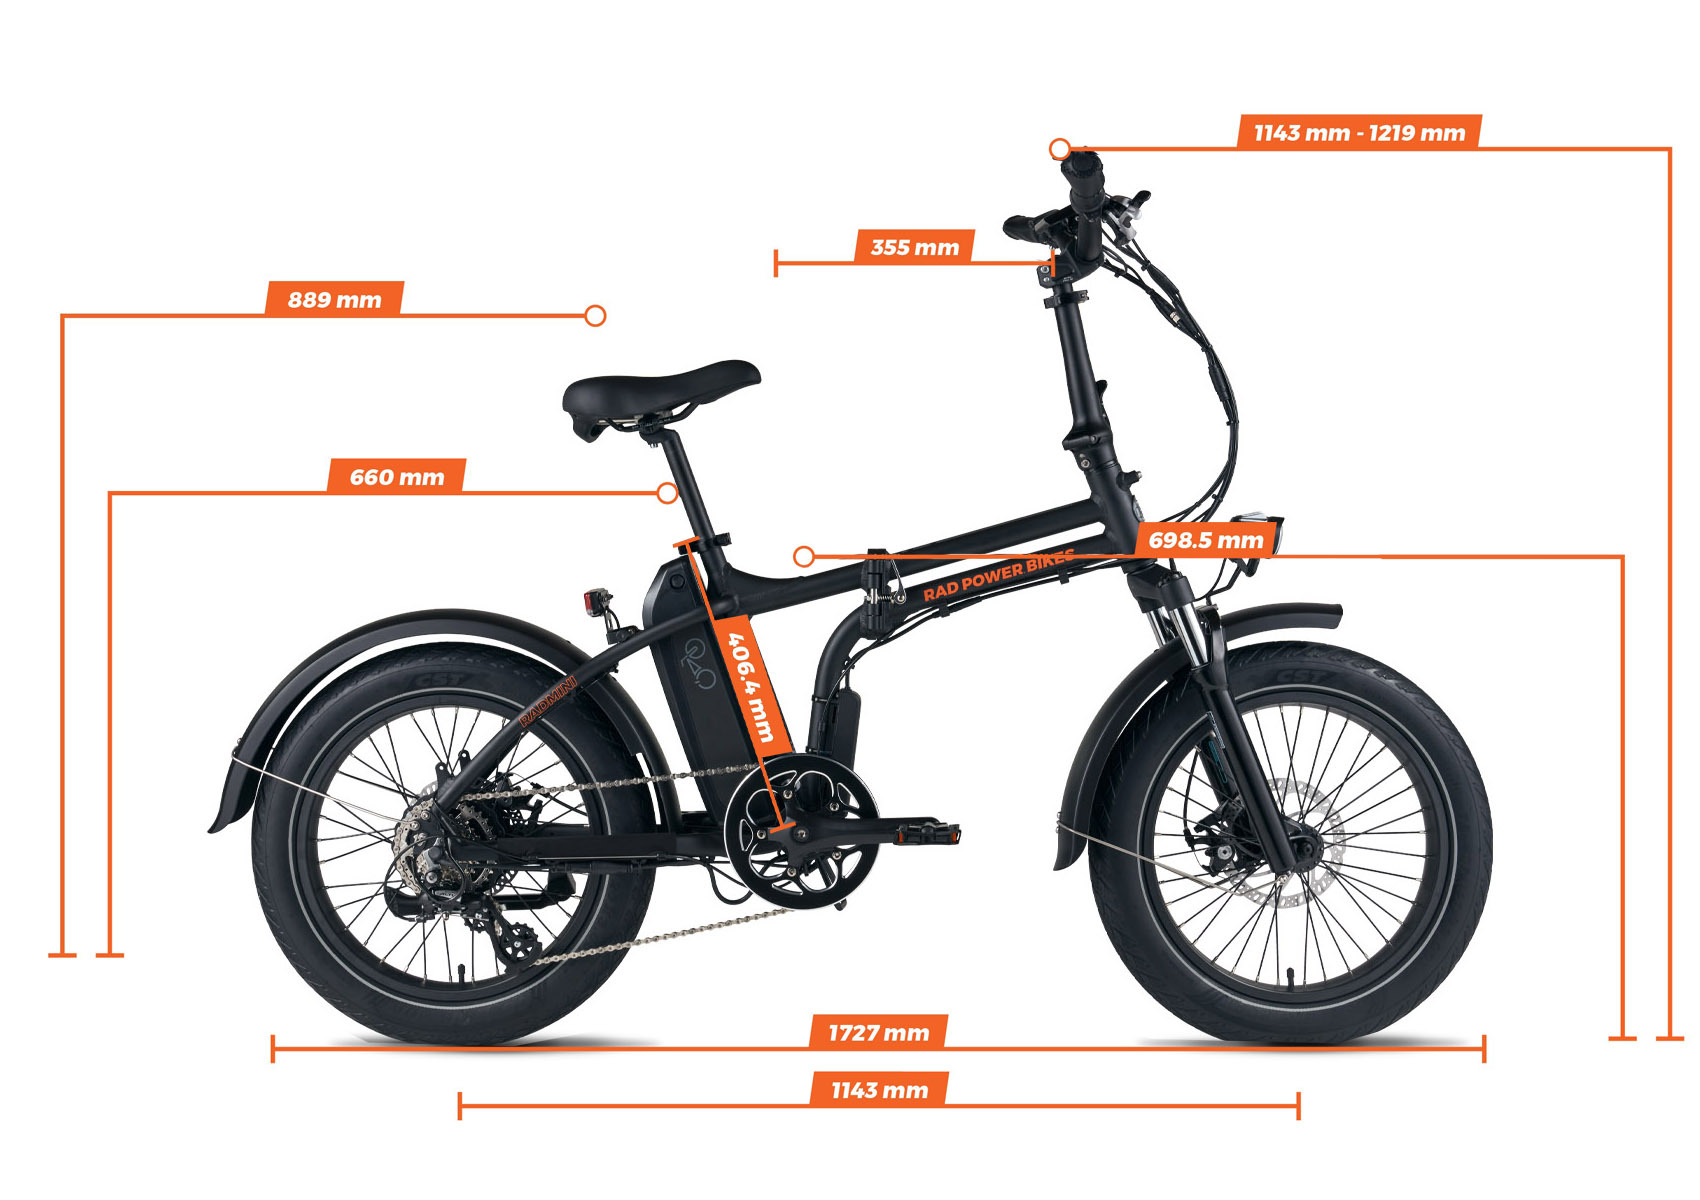 Geometry chart for the RadMini Electric Fat Bike